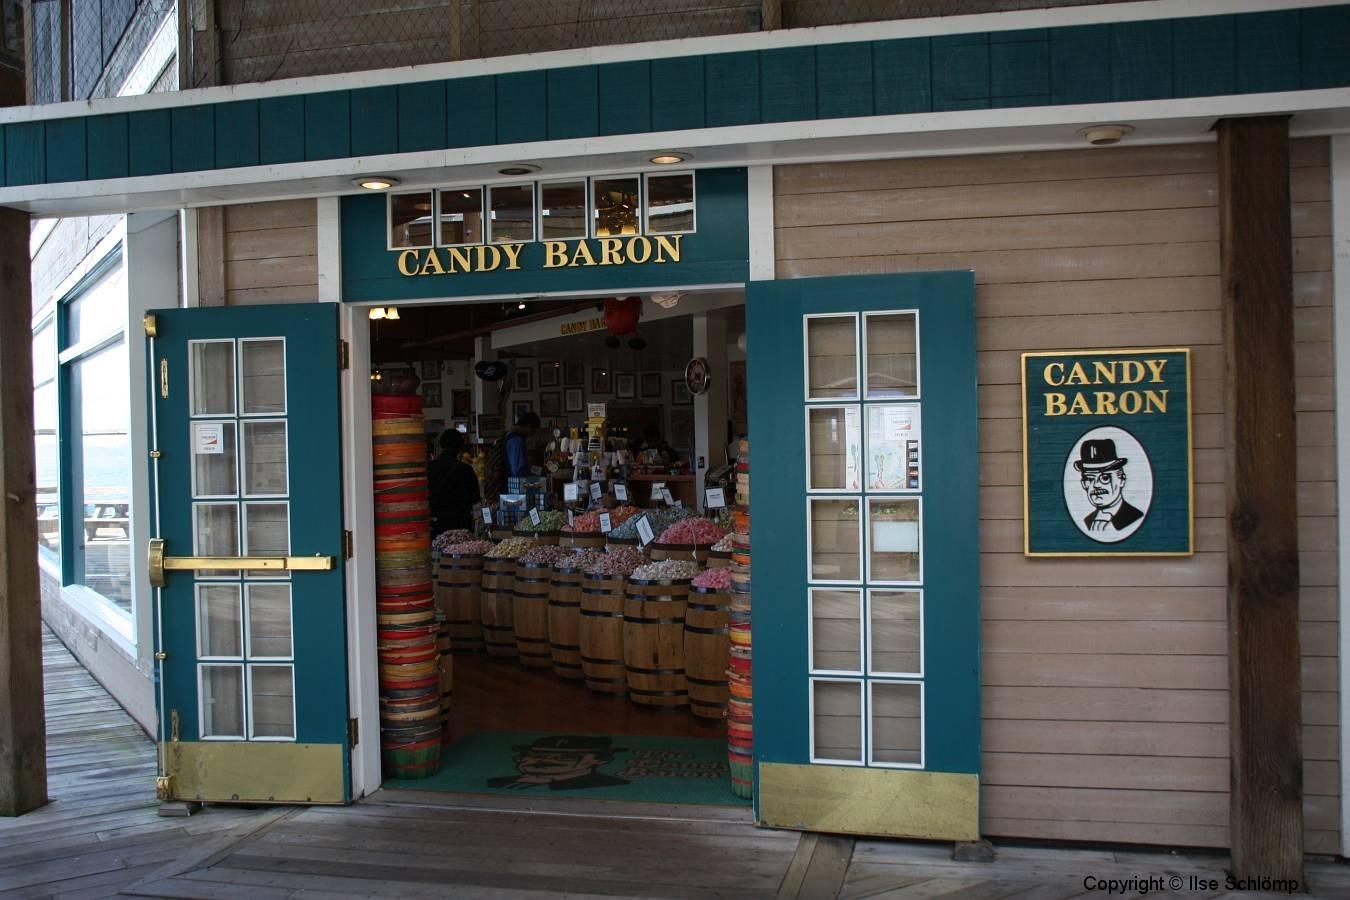 San Francisco, Fisherman's Wharf, Candy Baron